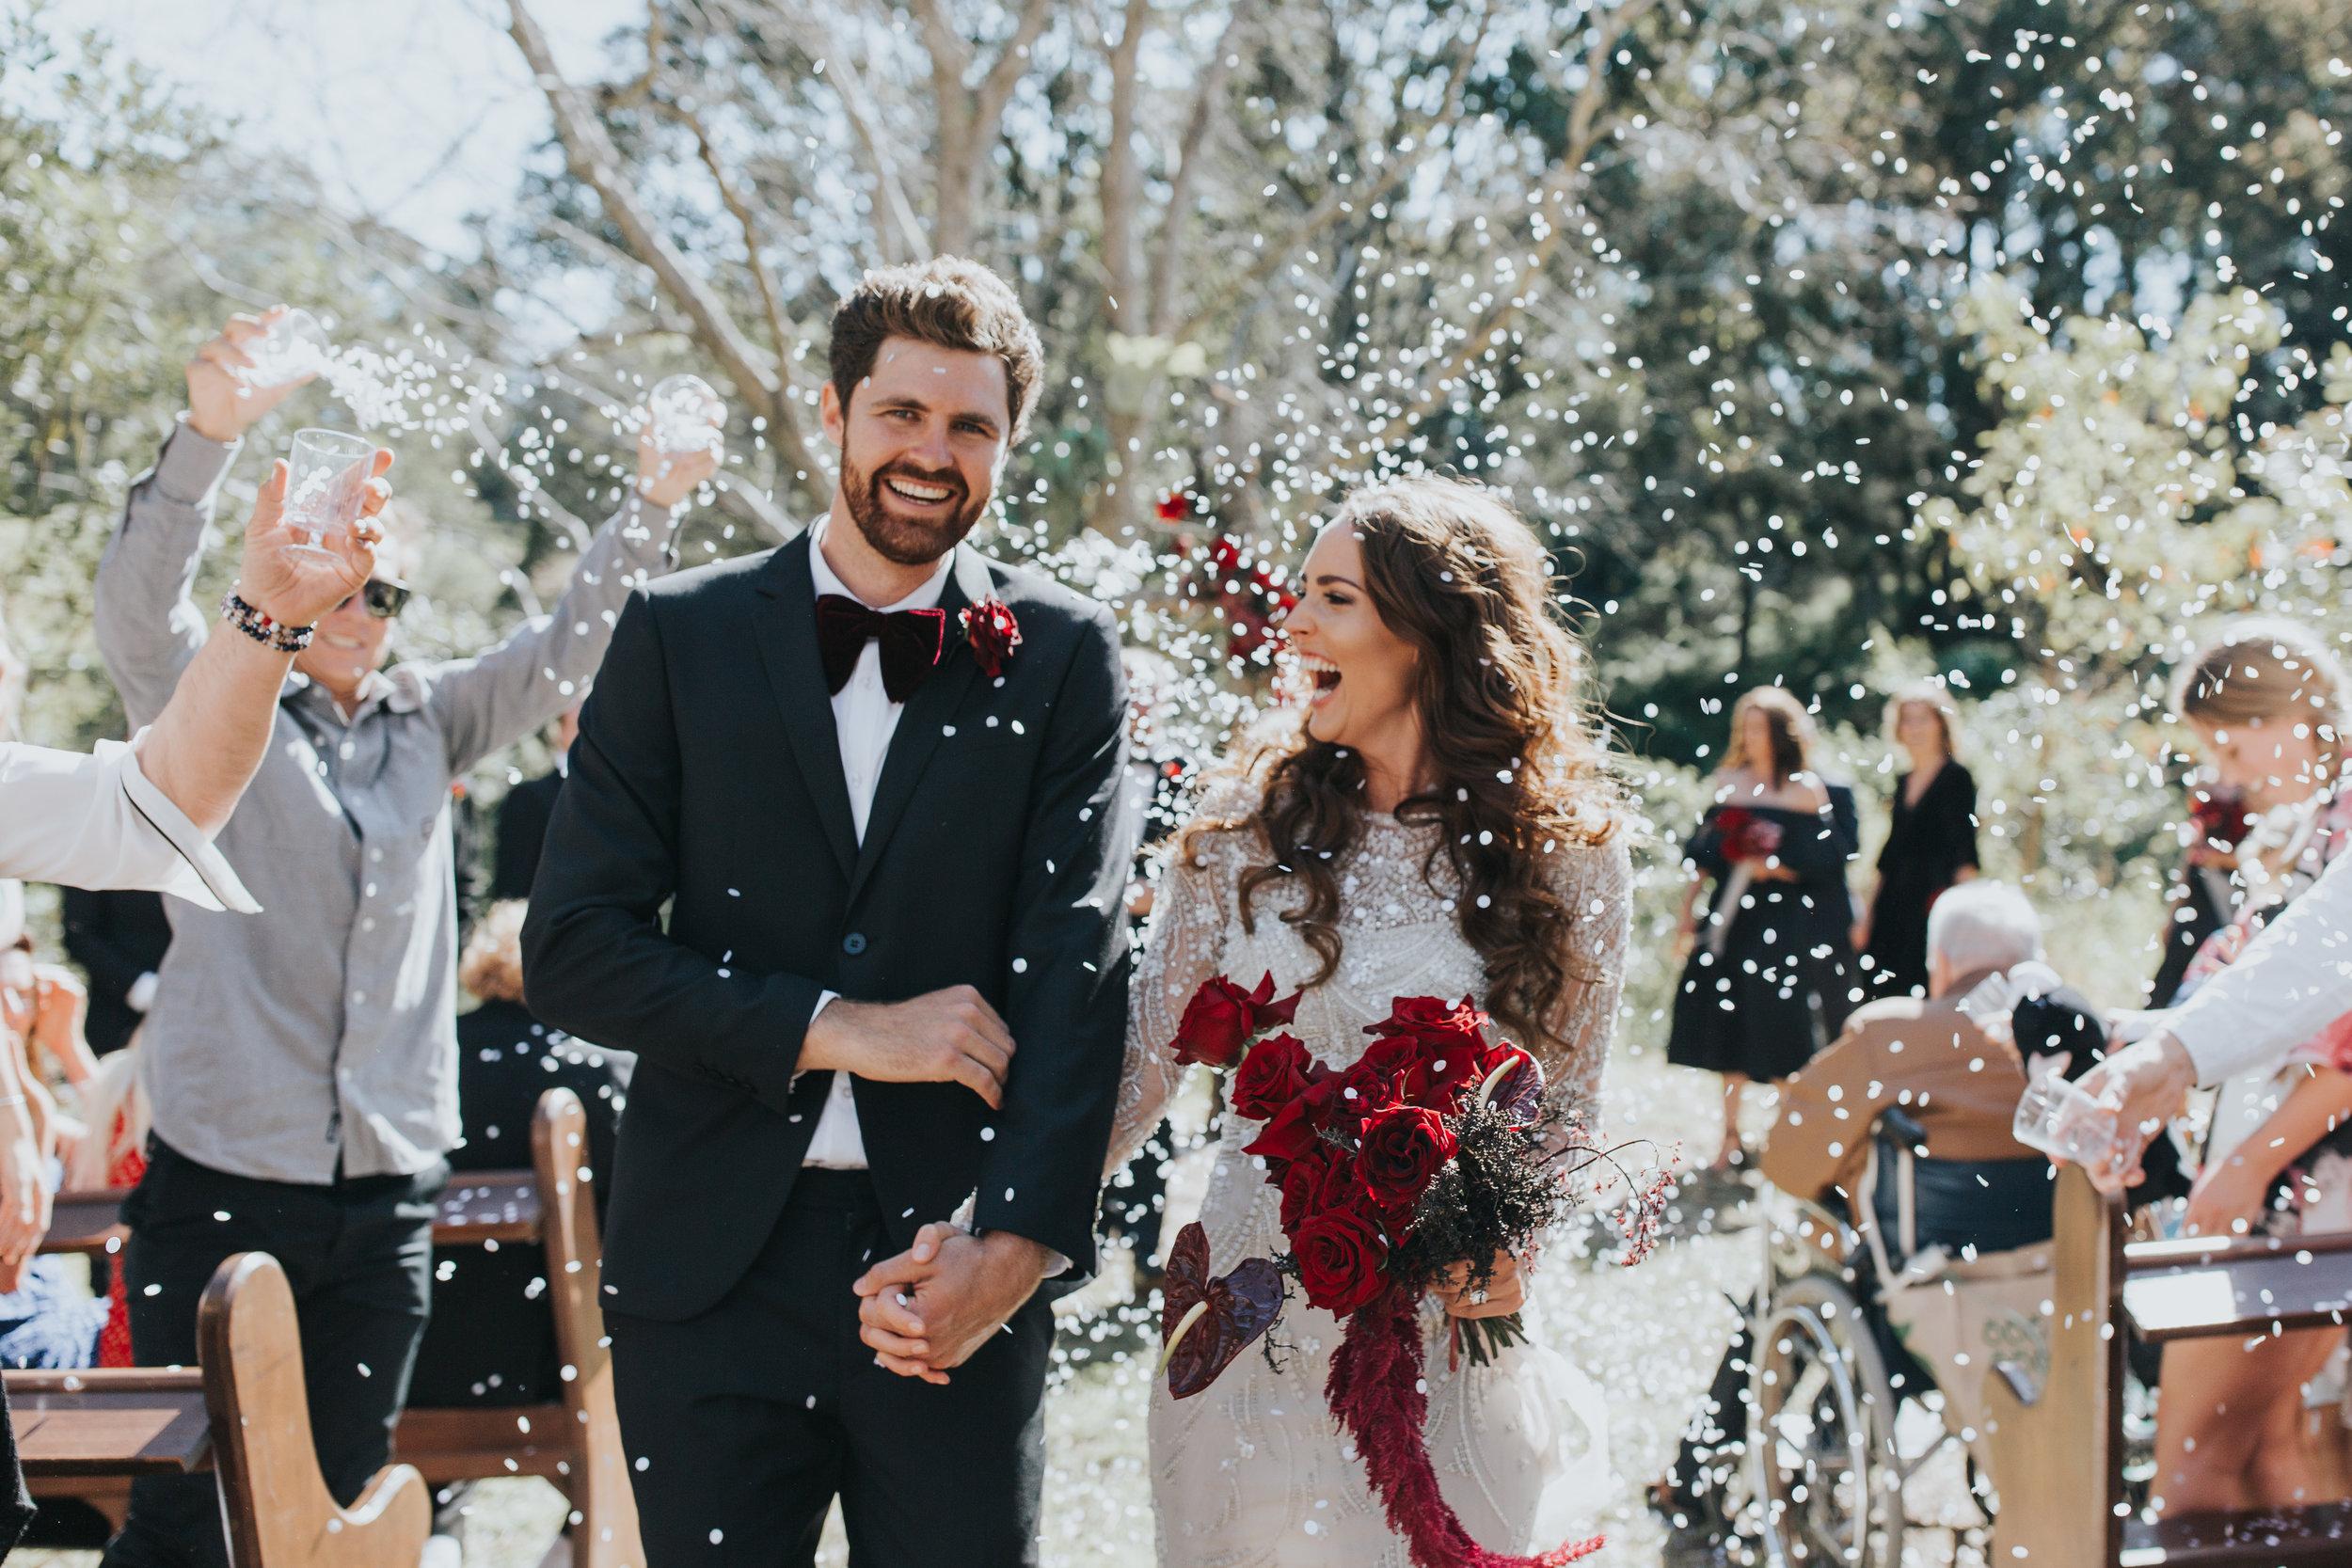 Bloodwood Botanica | Red noosa sunshine coast wedding flowers